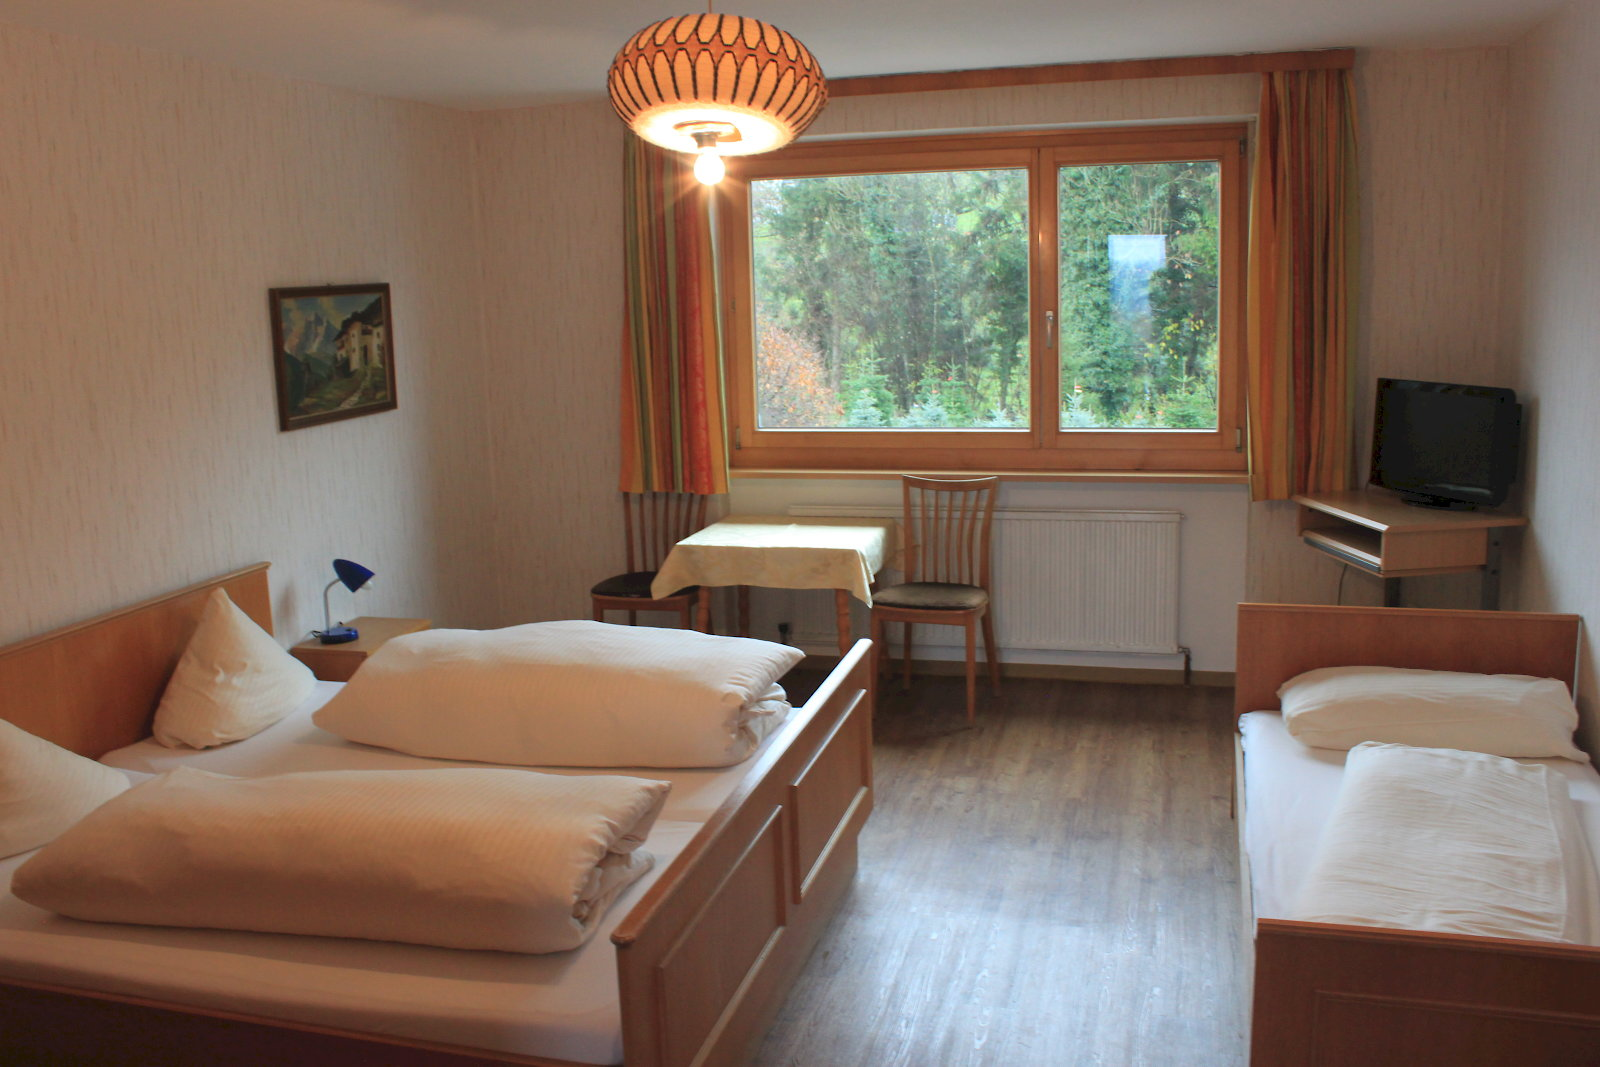 Appartement de vacances B&B - Restaurant TSINGDAO (Hörbranz). Dreibettzimmer (2437459), Hörbranz, Bregenz, Vorarlberg, Autriche, image 7